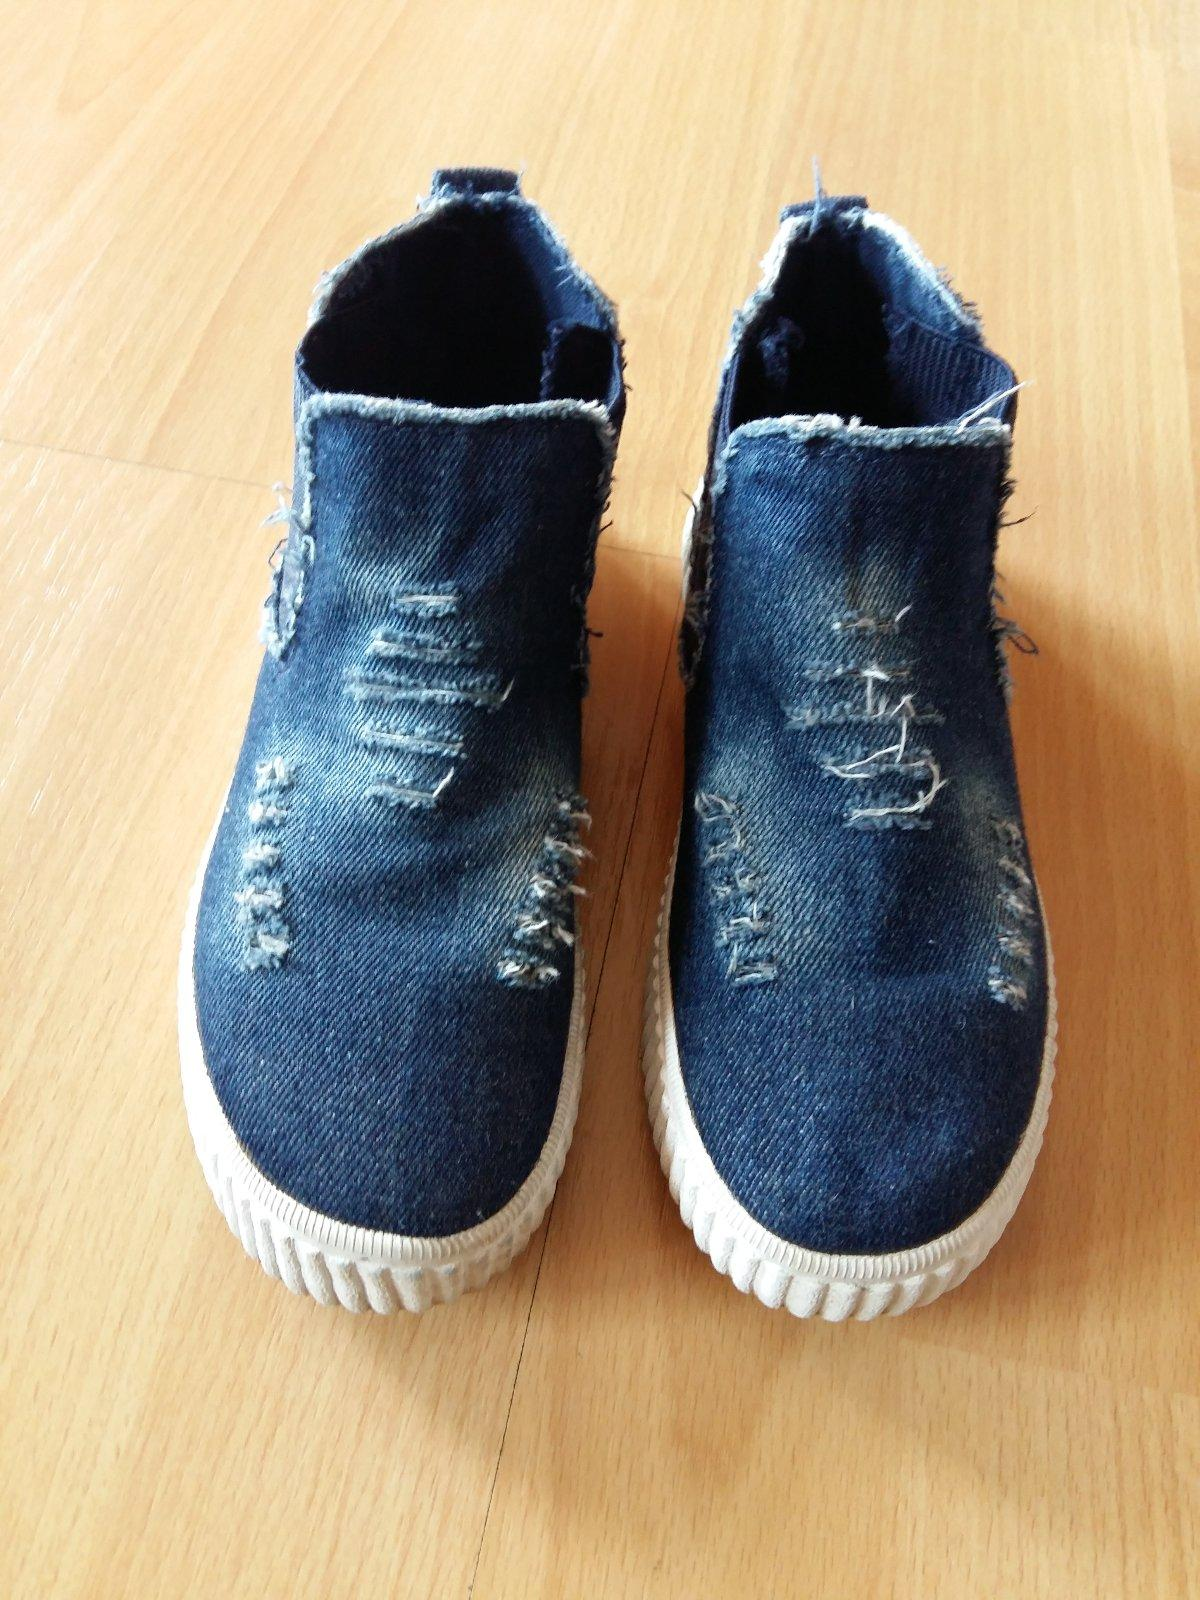 3d35199f84e1 Riflove topánky